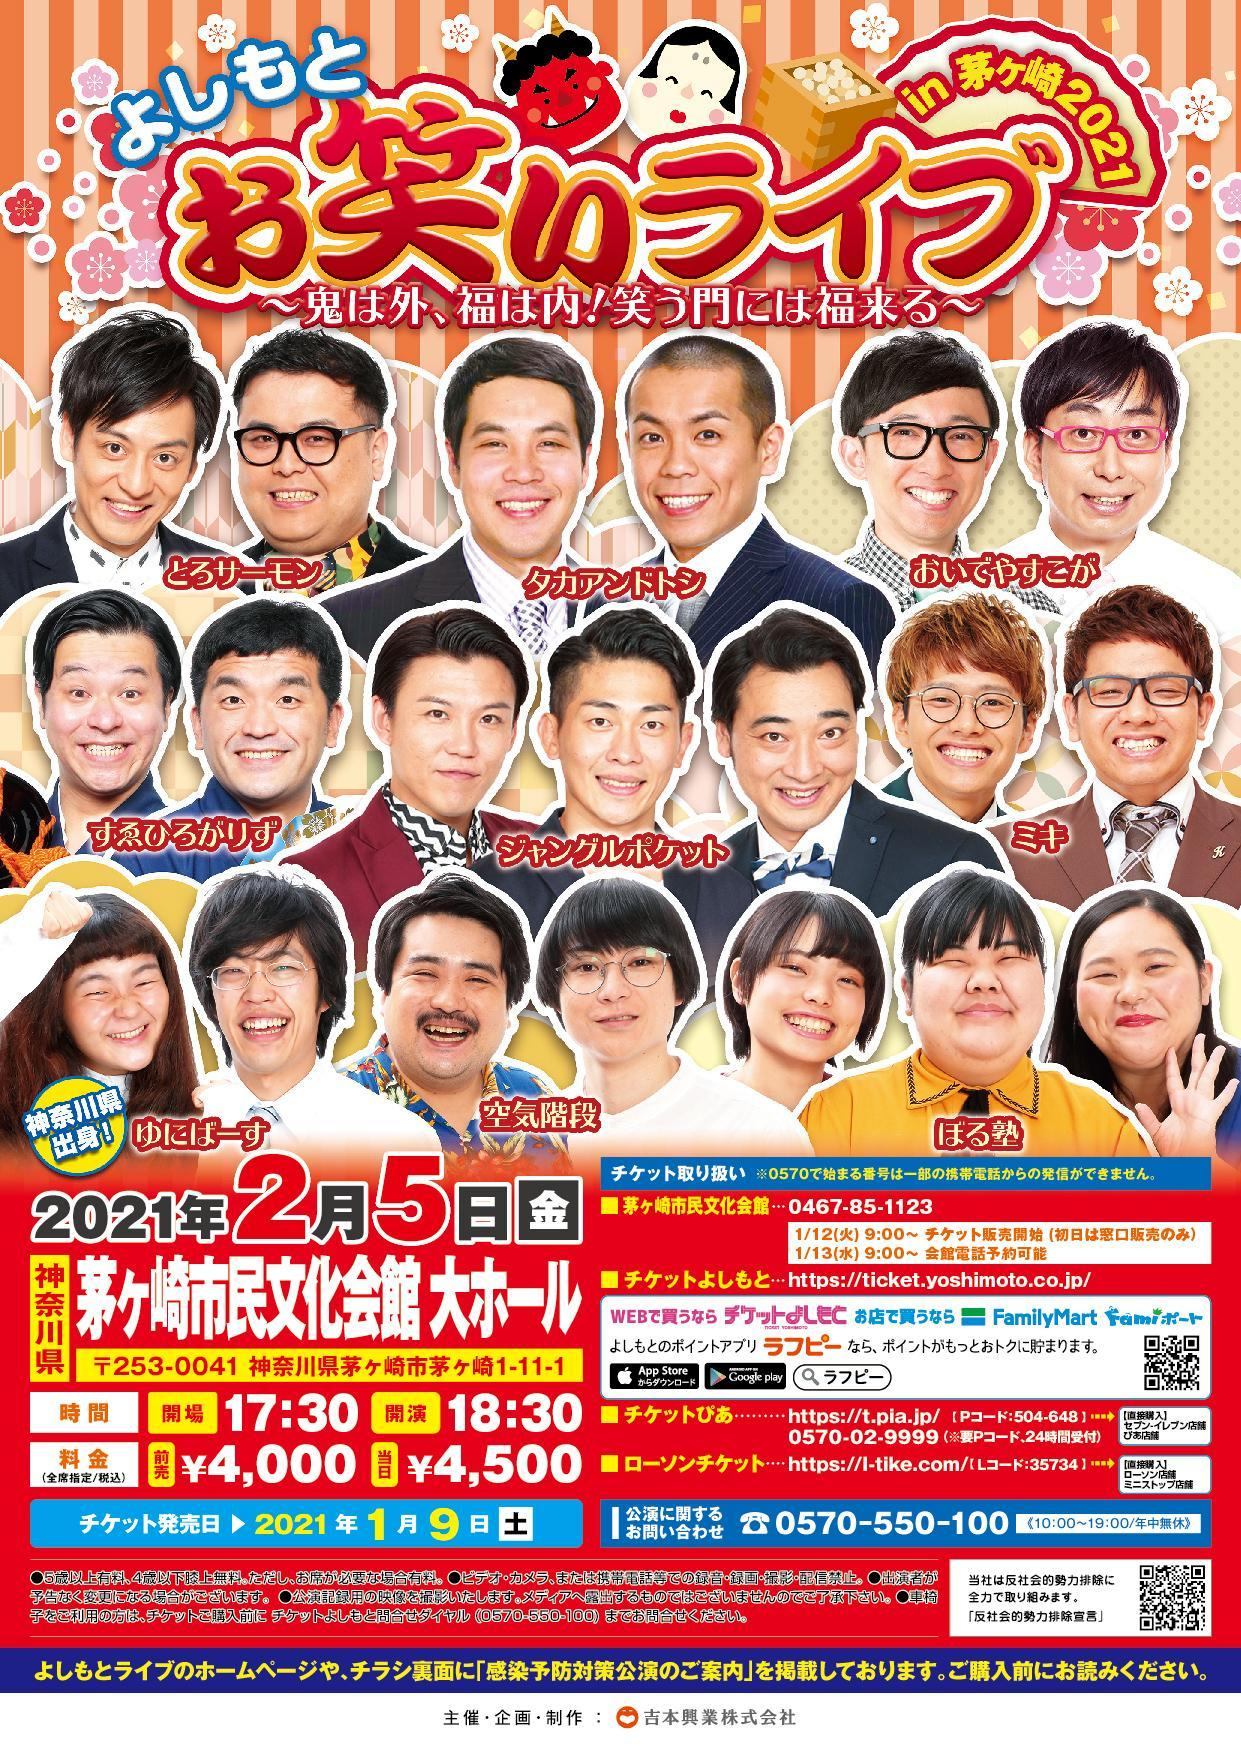 http://www.syumatsu.jp/20201227110756-429e8869f1d3972fc078da960fbc51d349ee239f.jpg